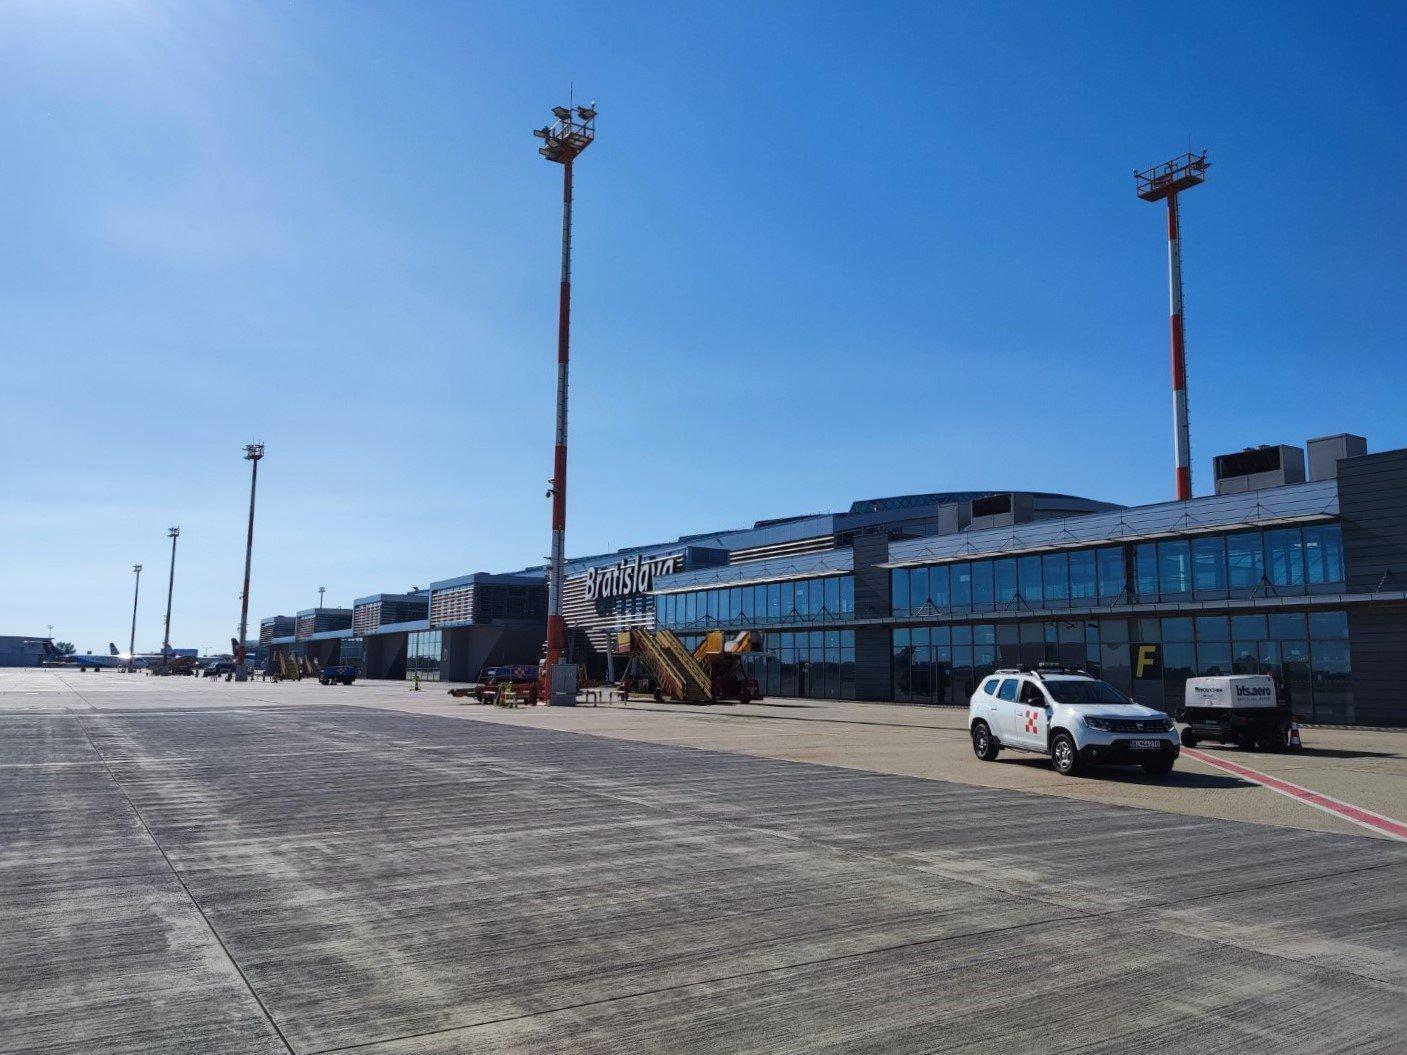 Вид с перрона на пассажирский терминал аэропорта Братислава